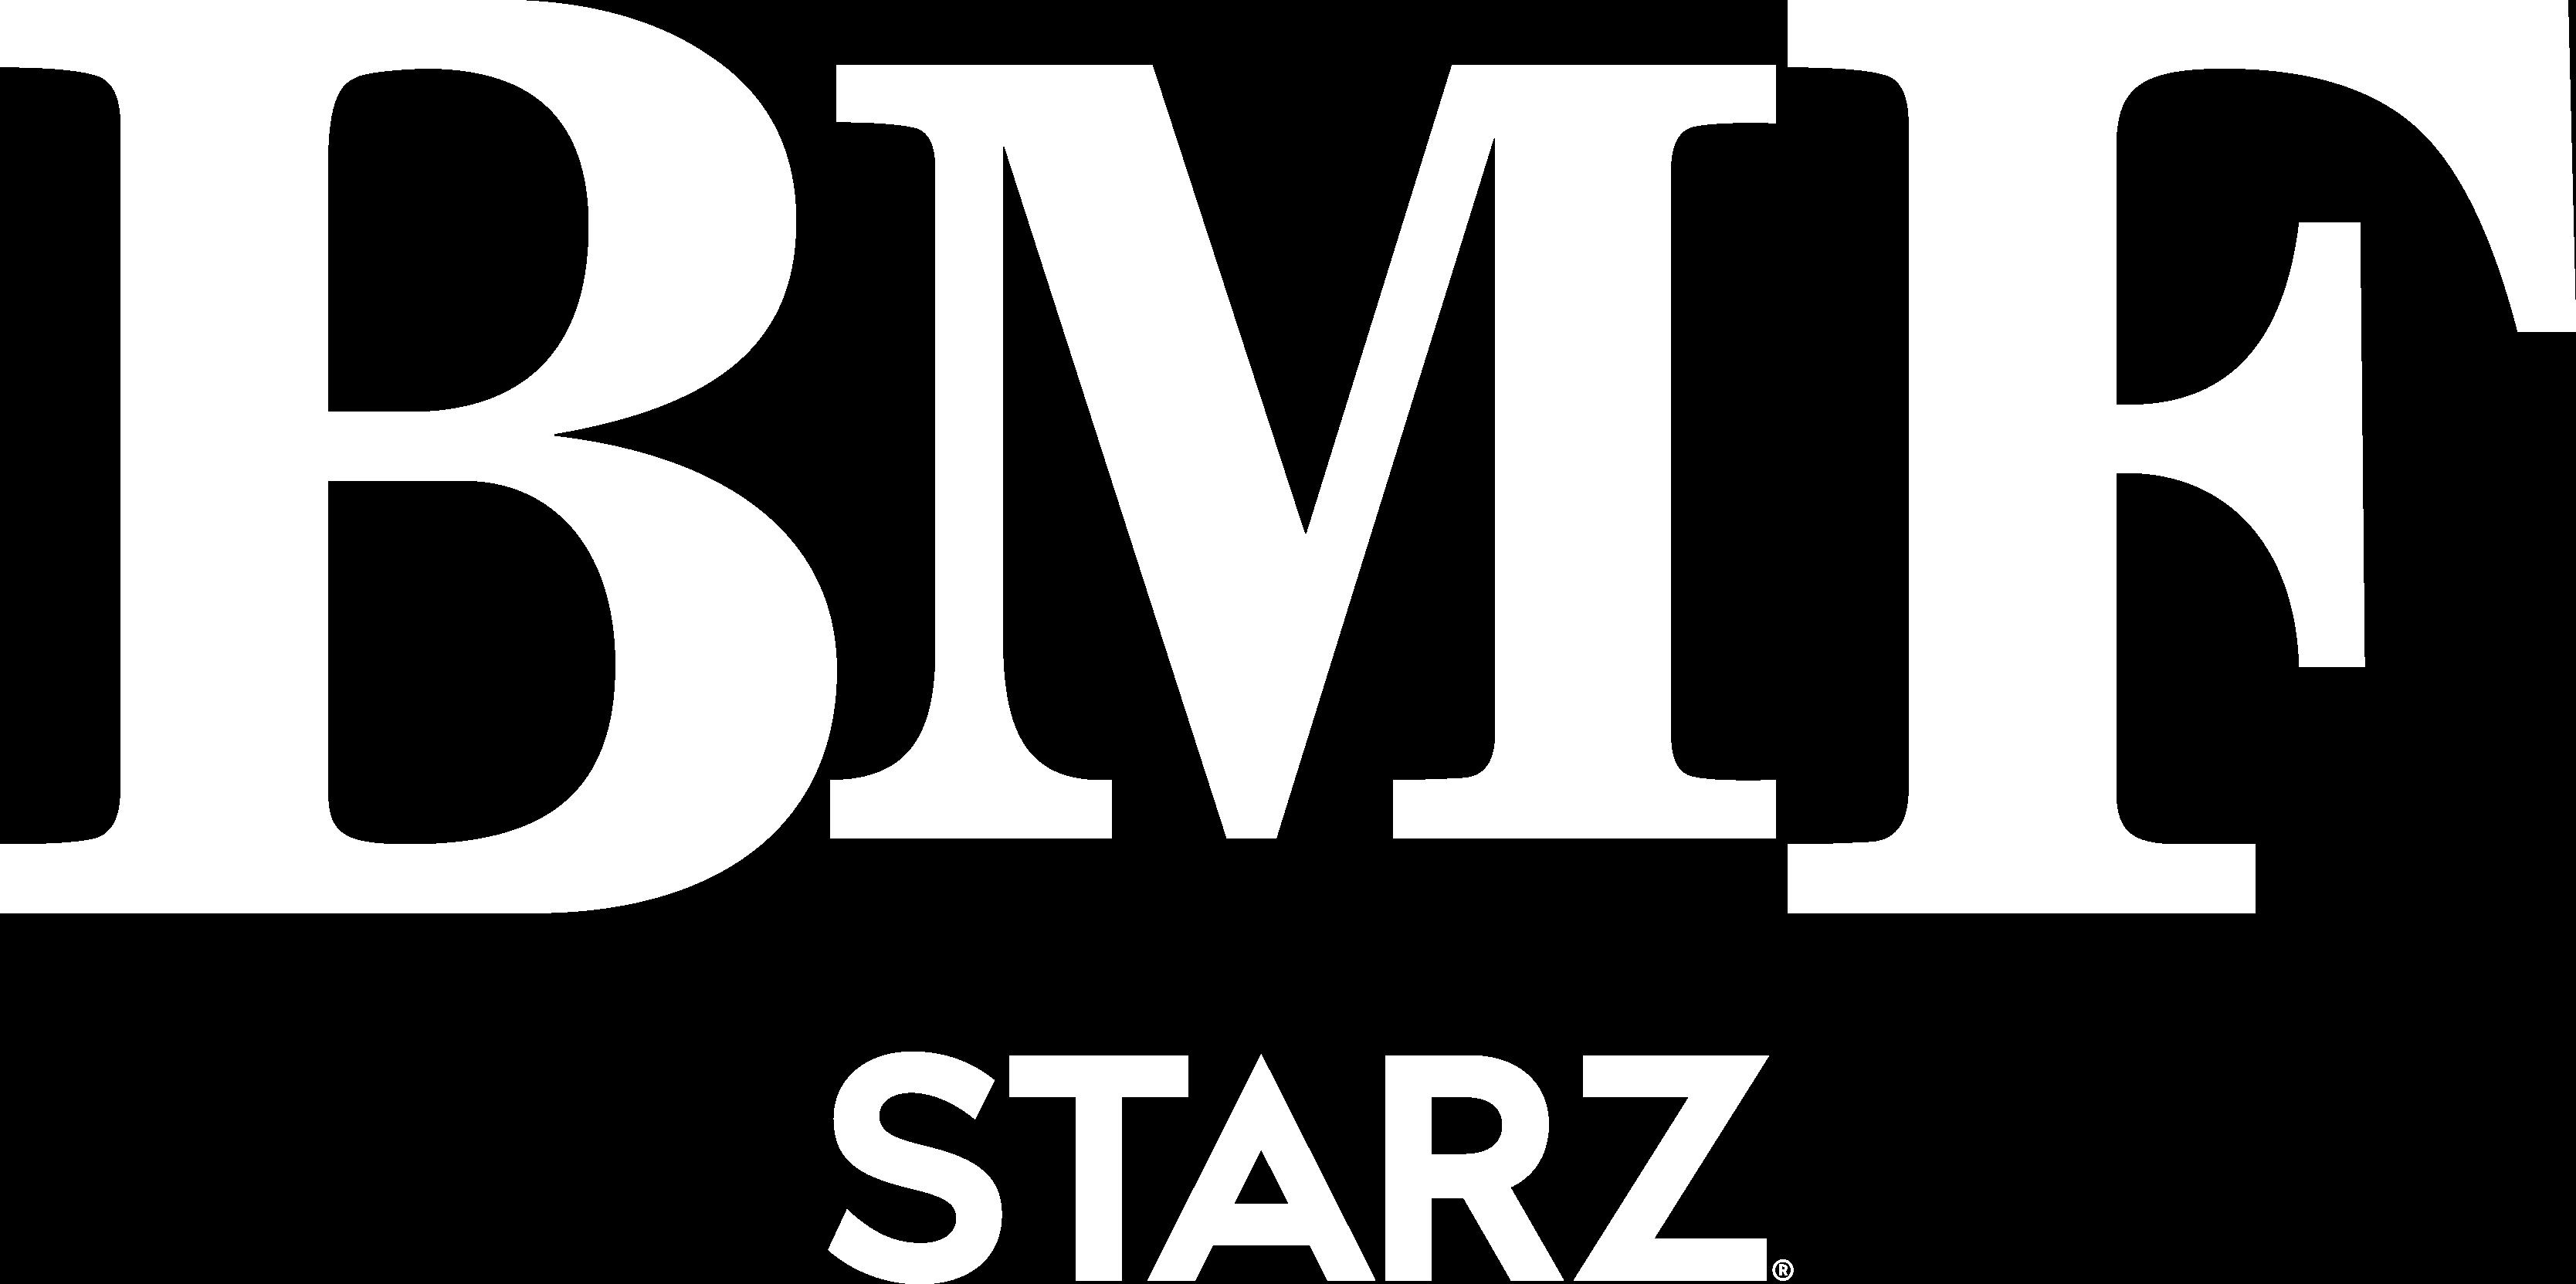 Black Mafia Family logo